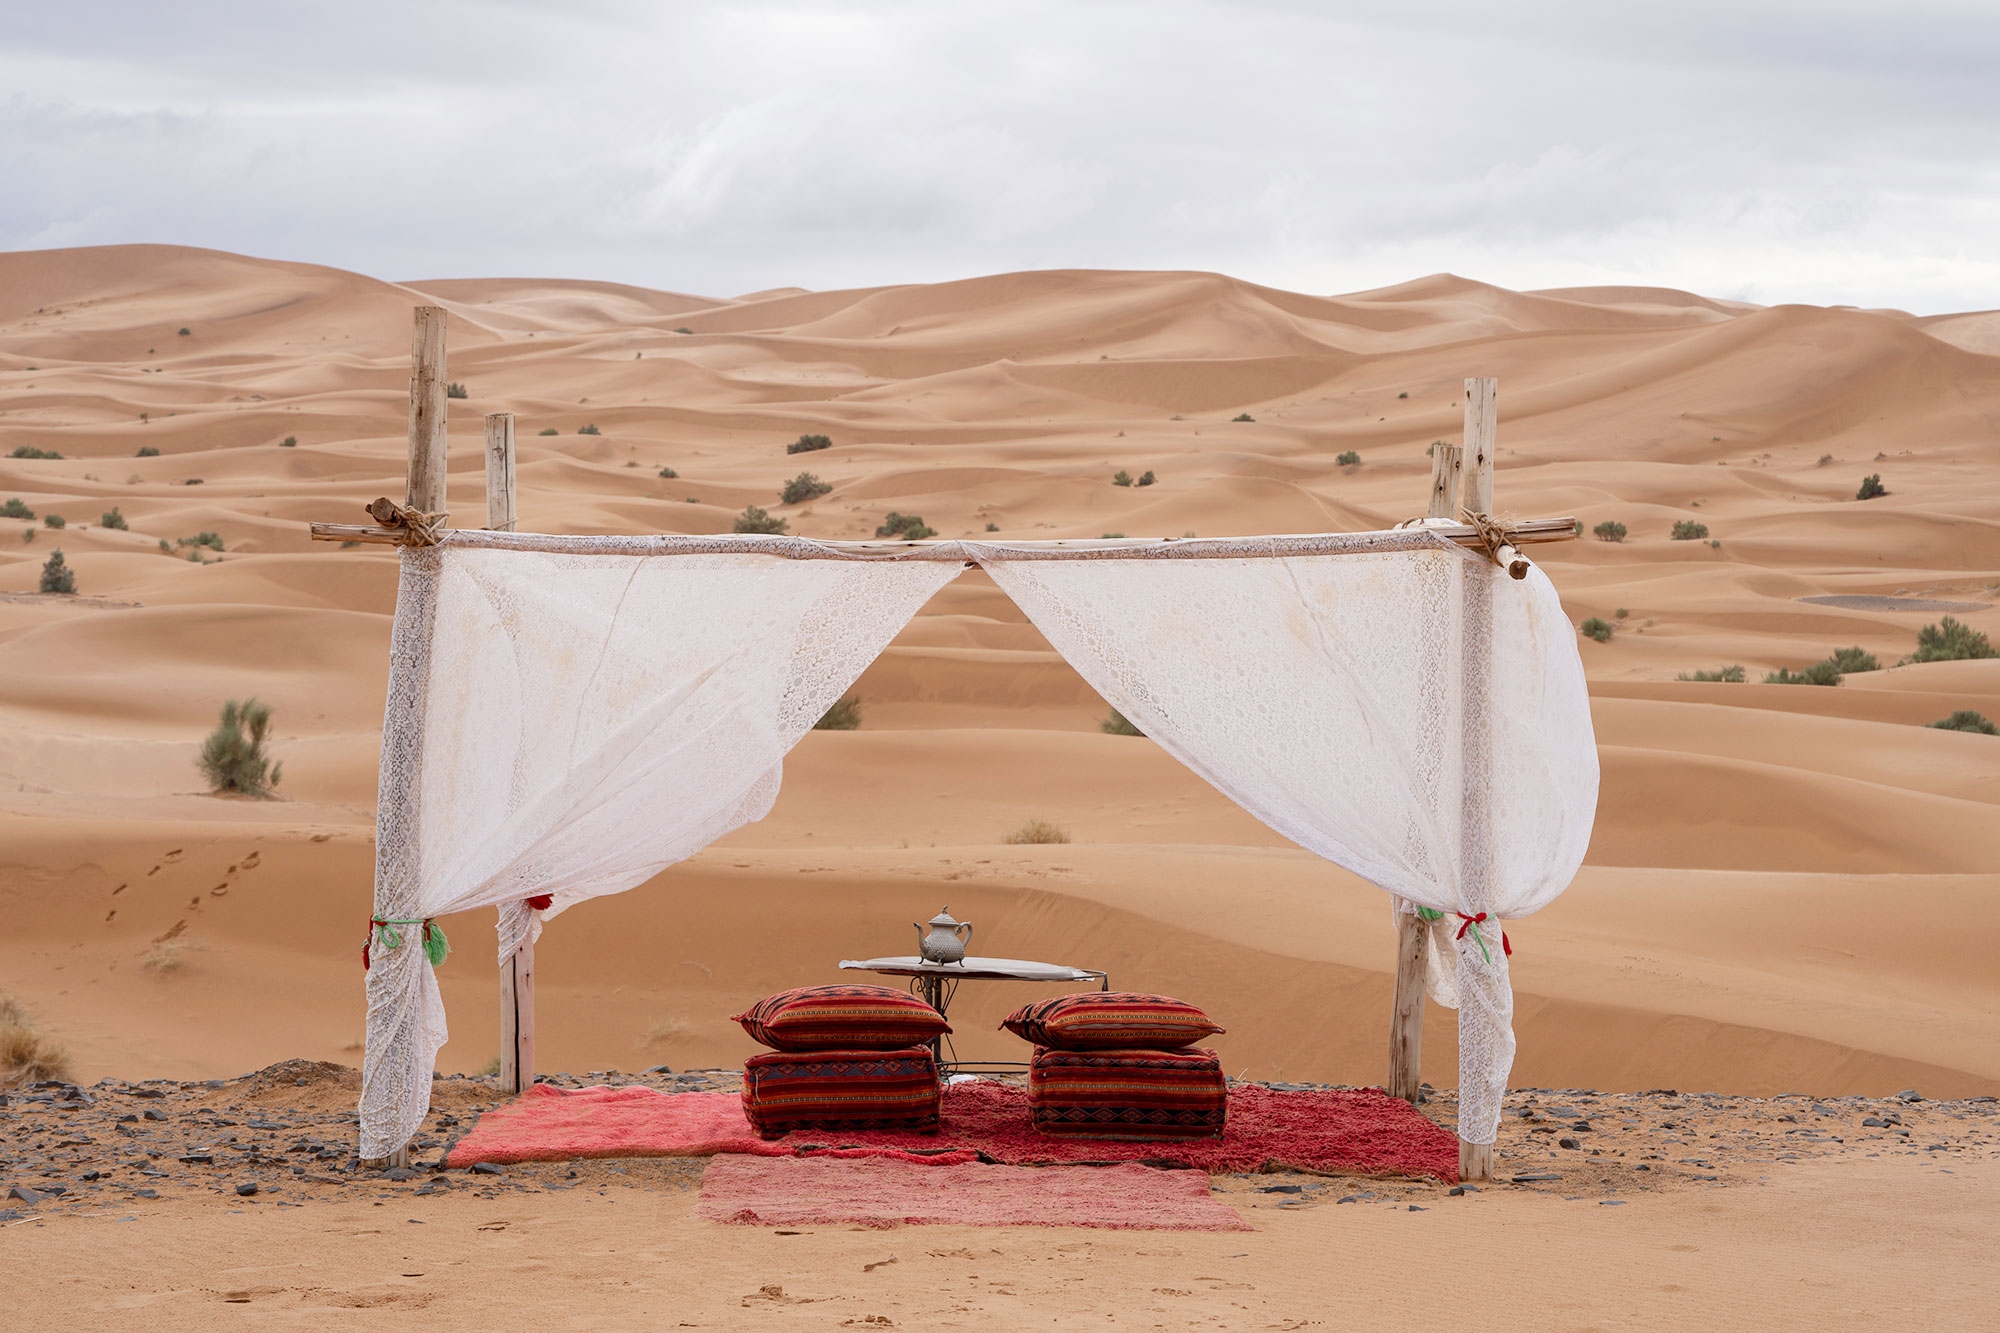 Tea service in the desert, Morocco